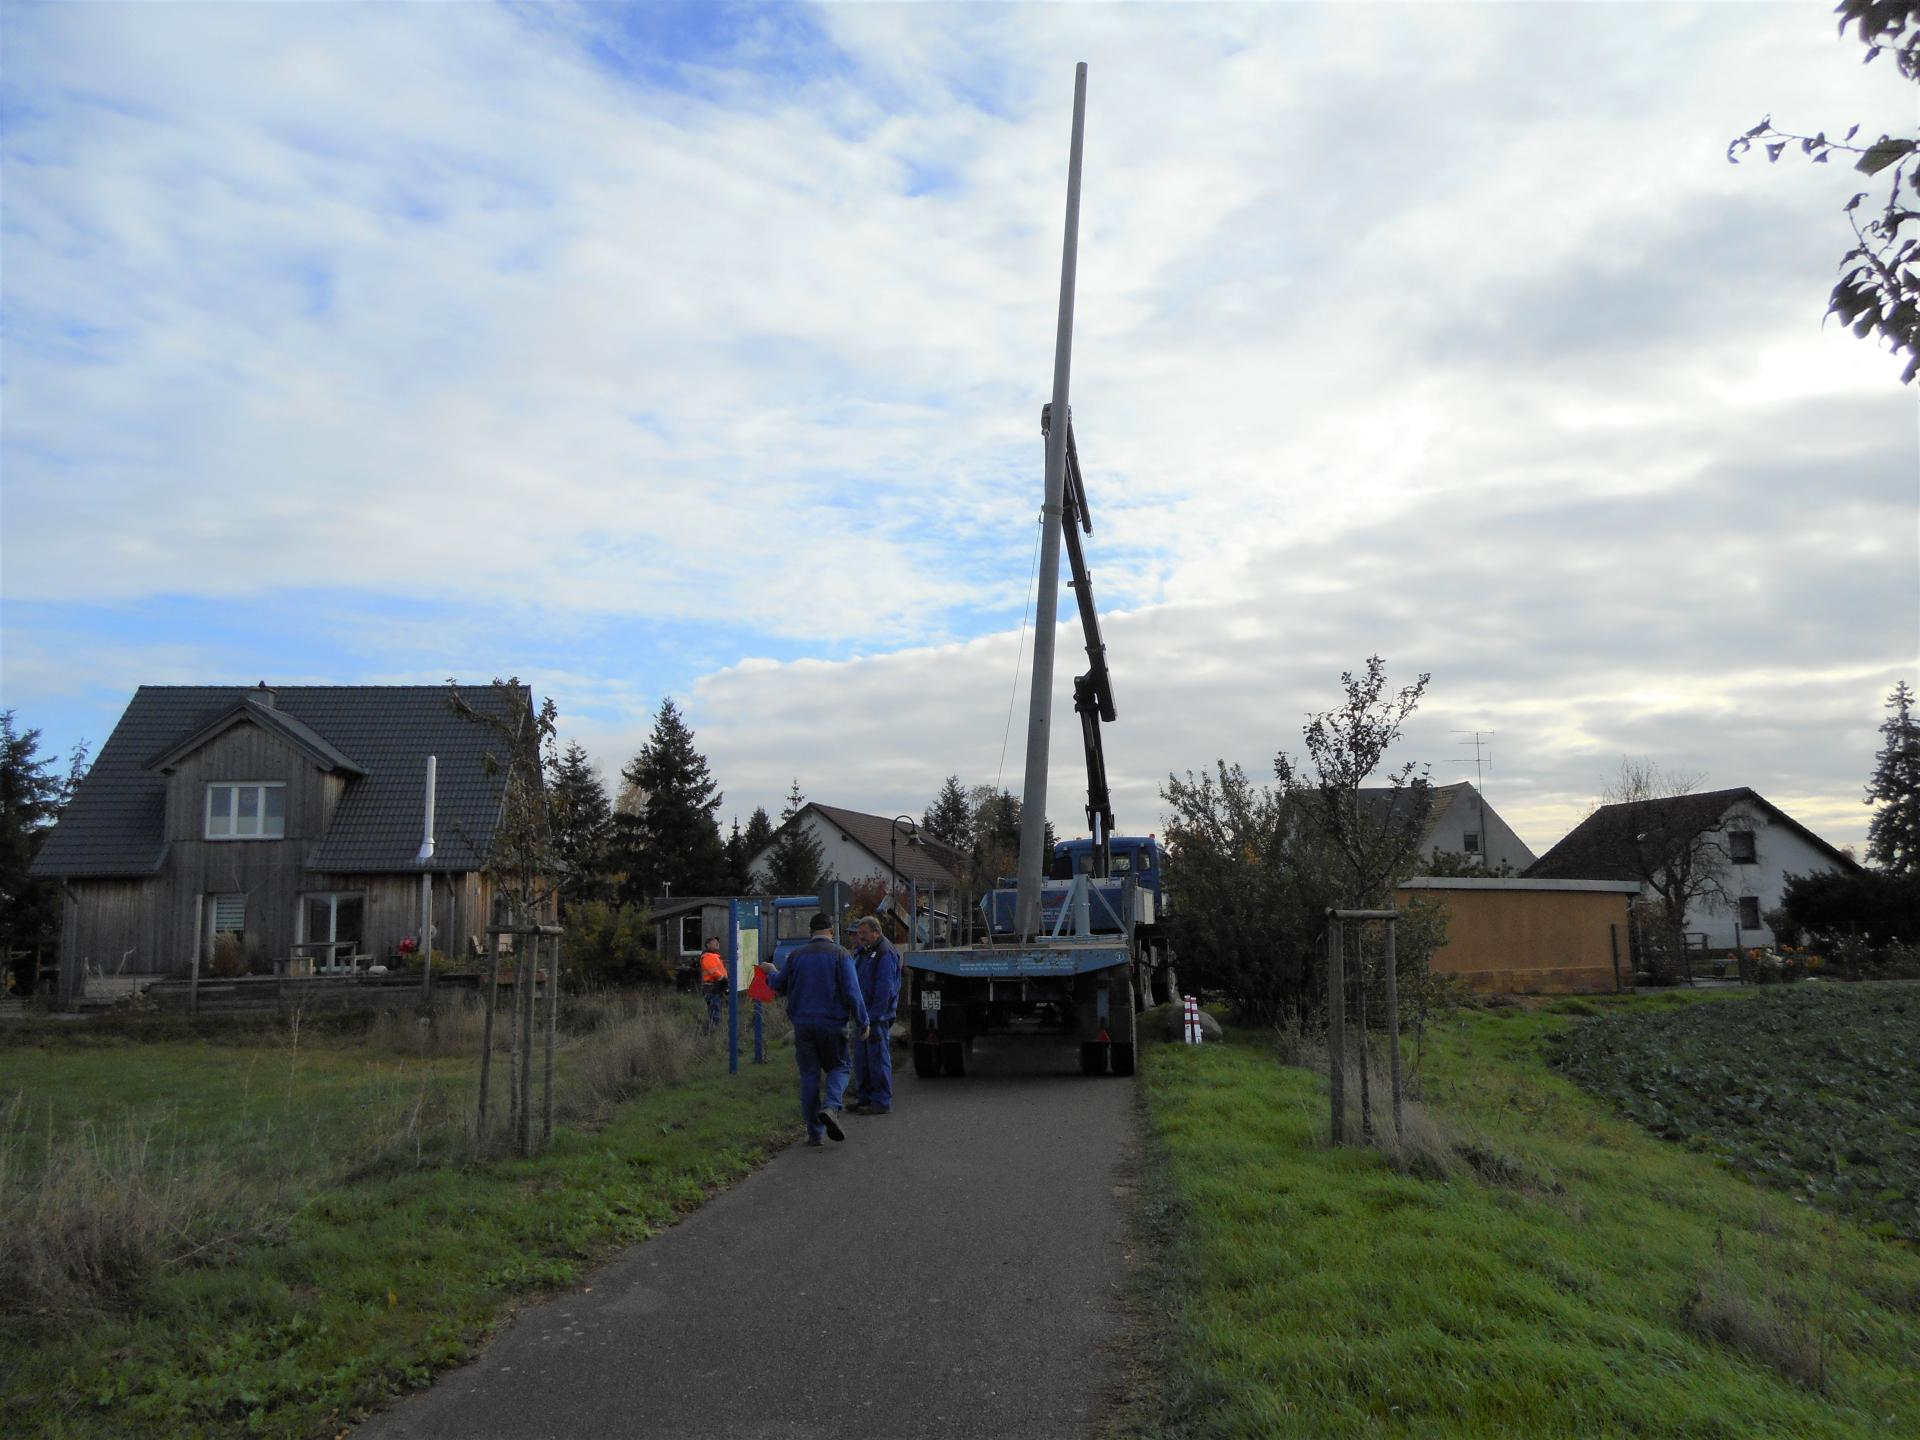 2020-11-03_Storchenhorst-Zinna-02